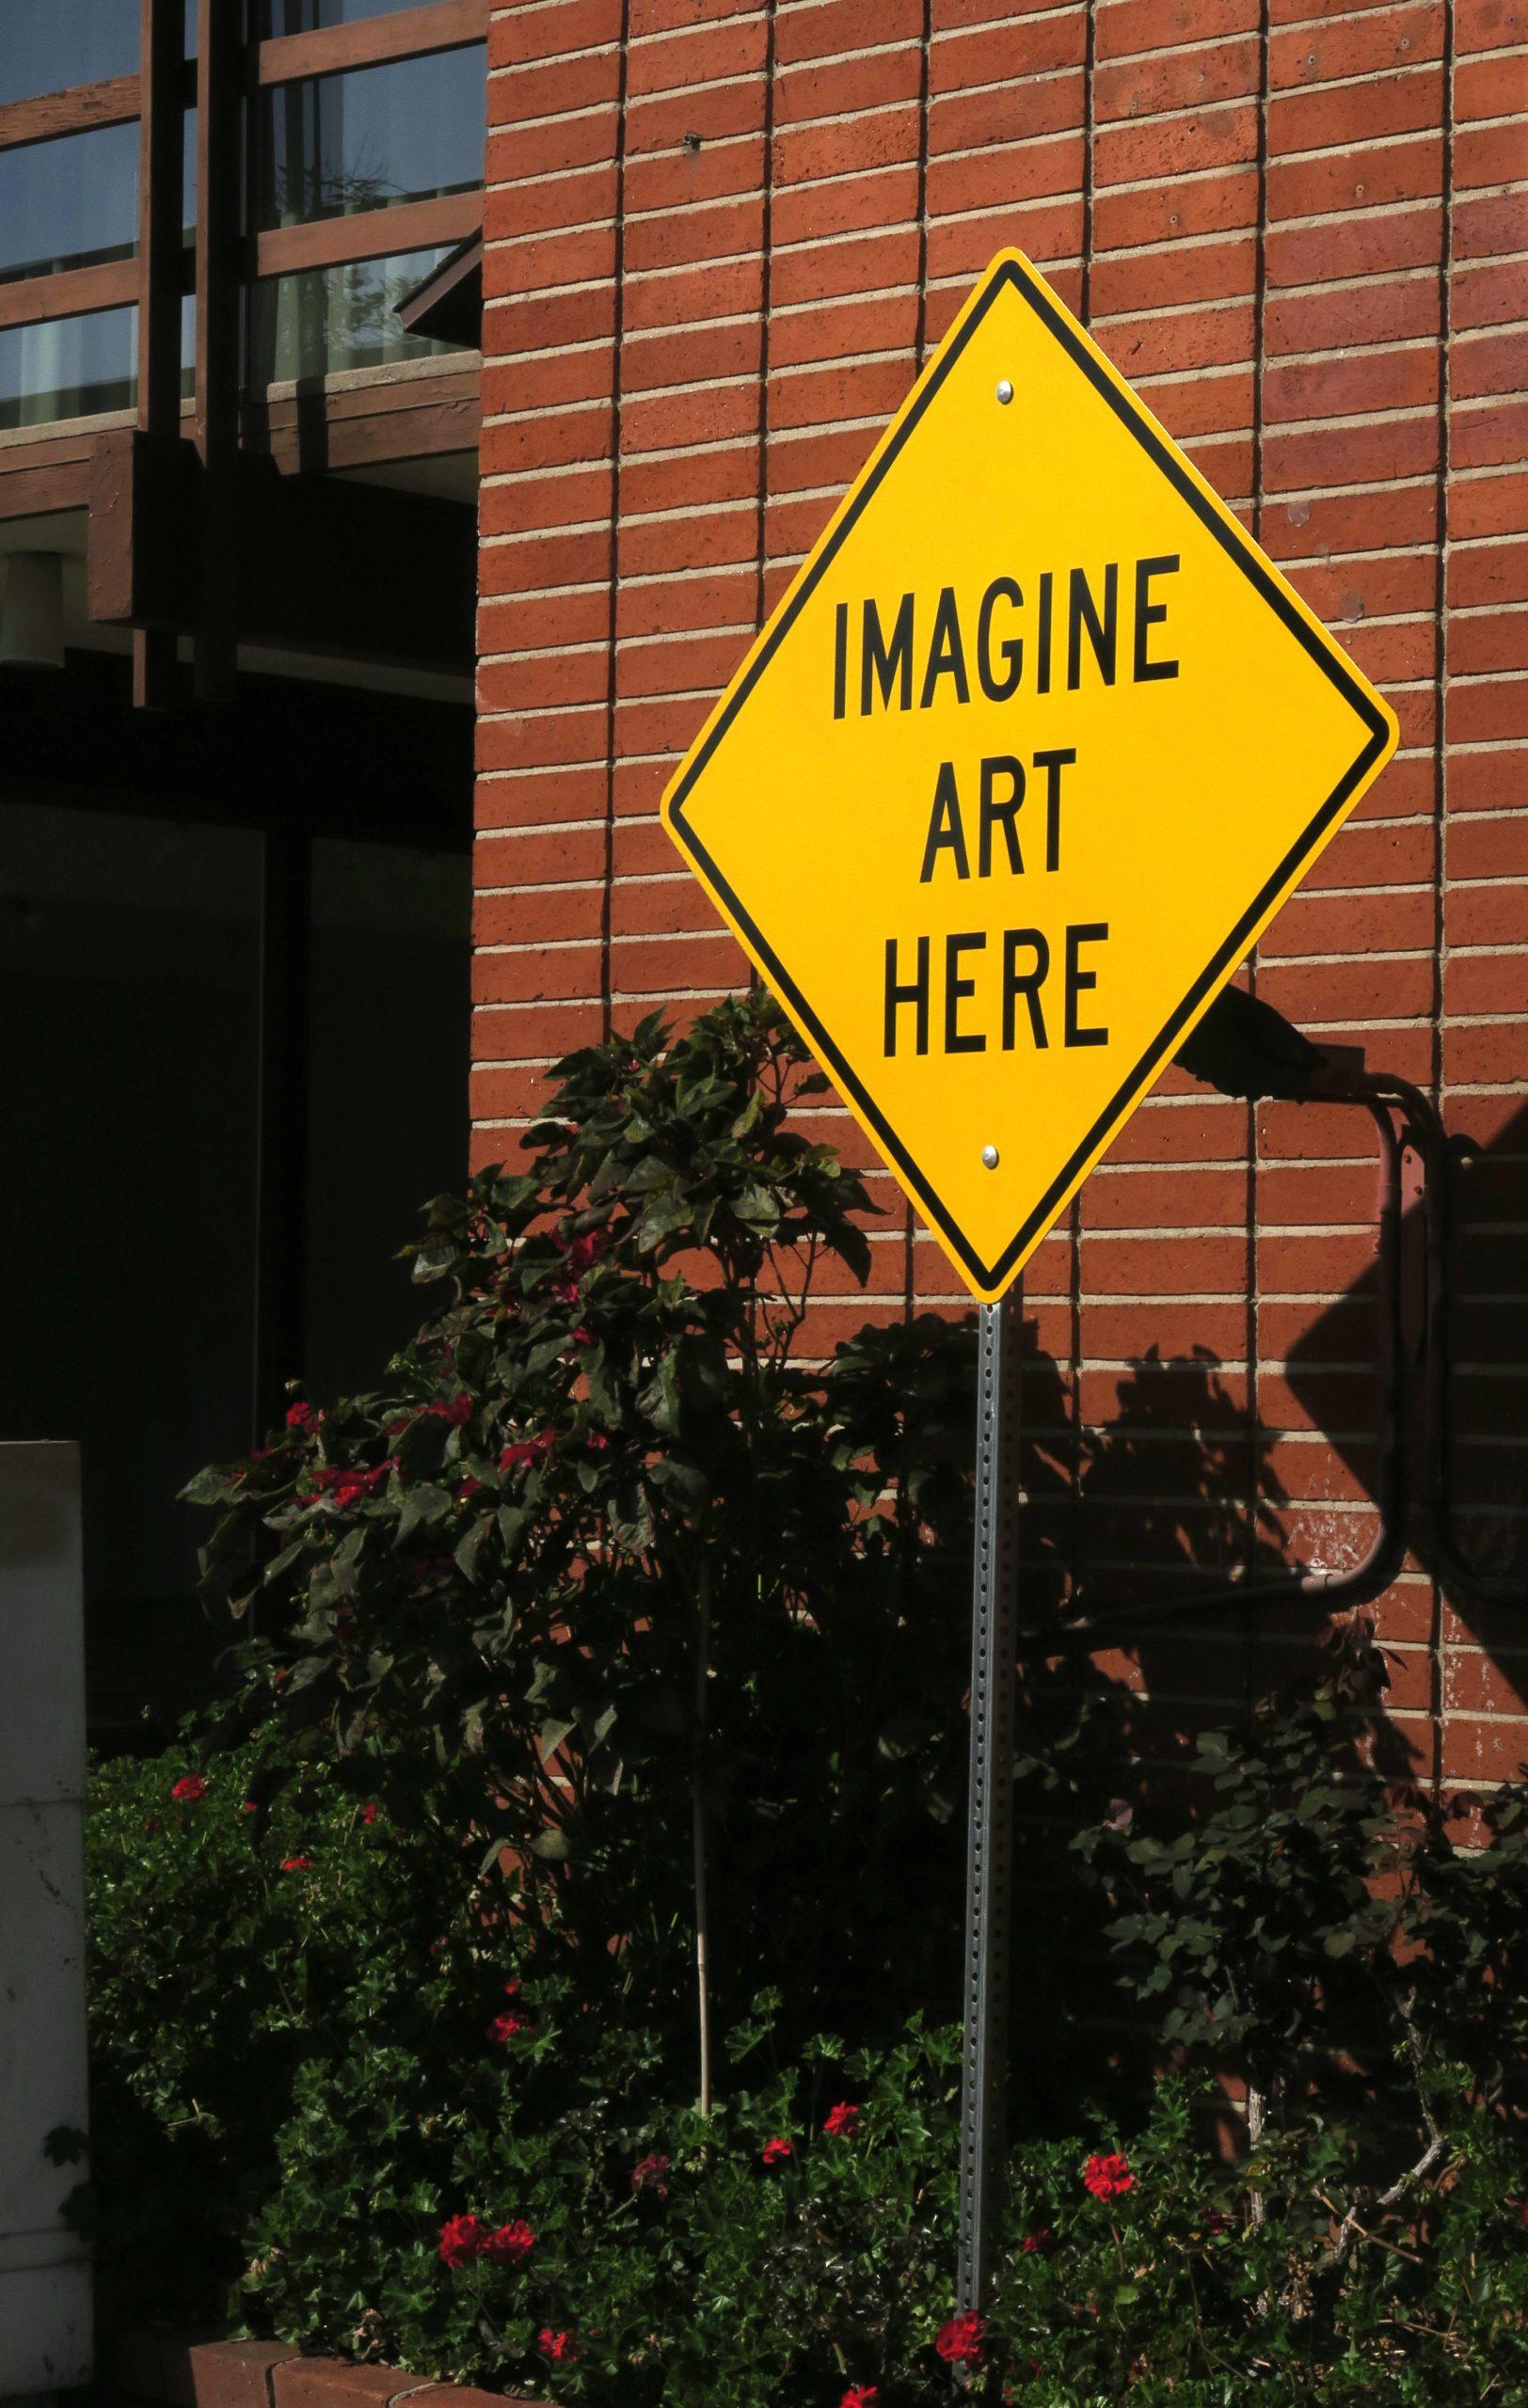 humorous ironic fake street sign